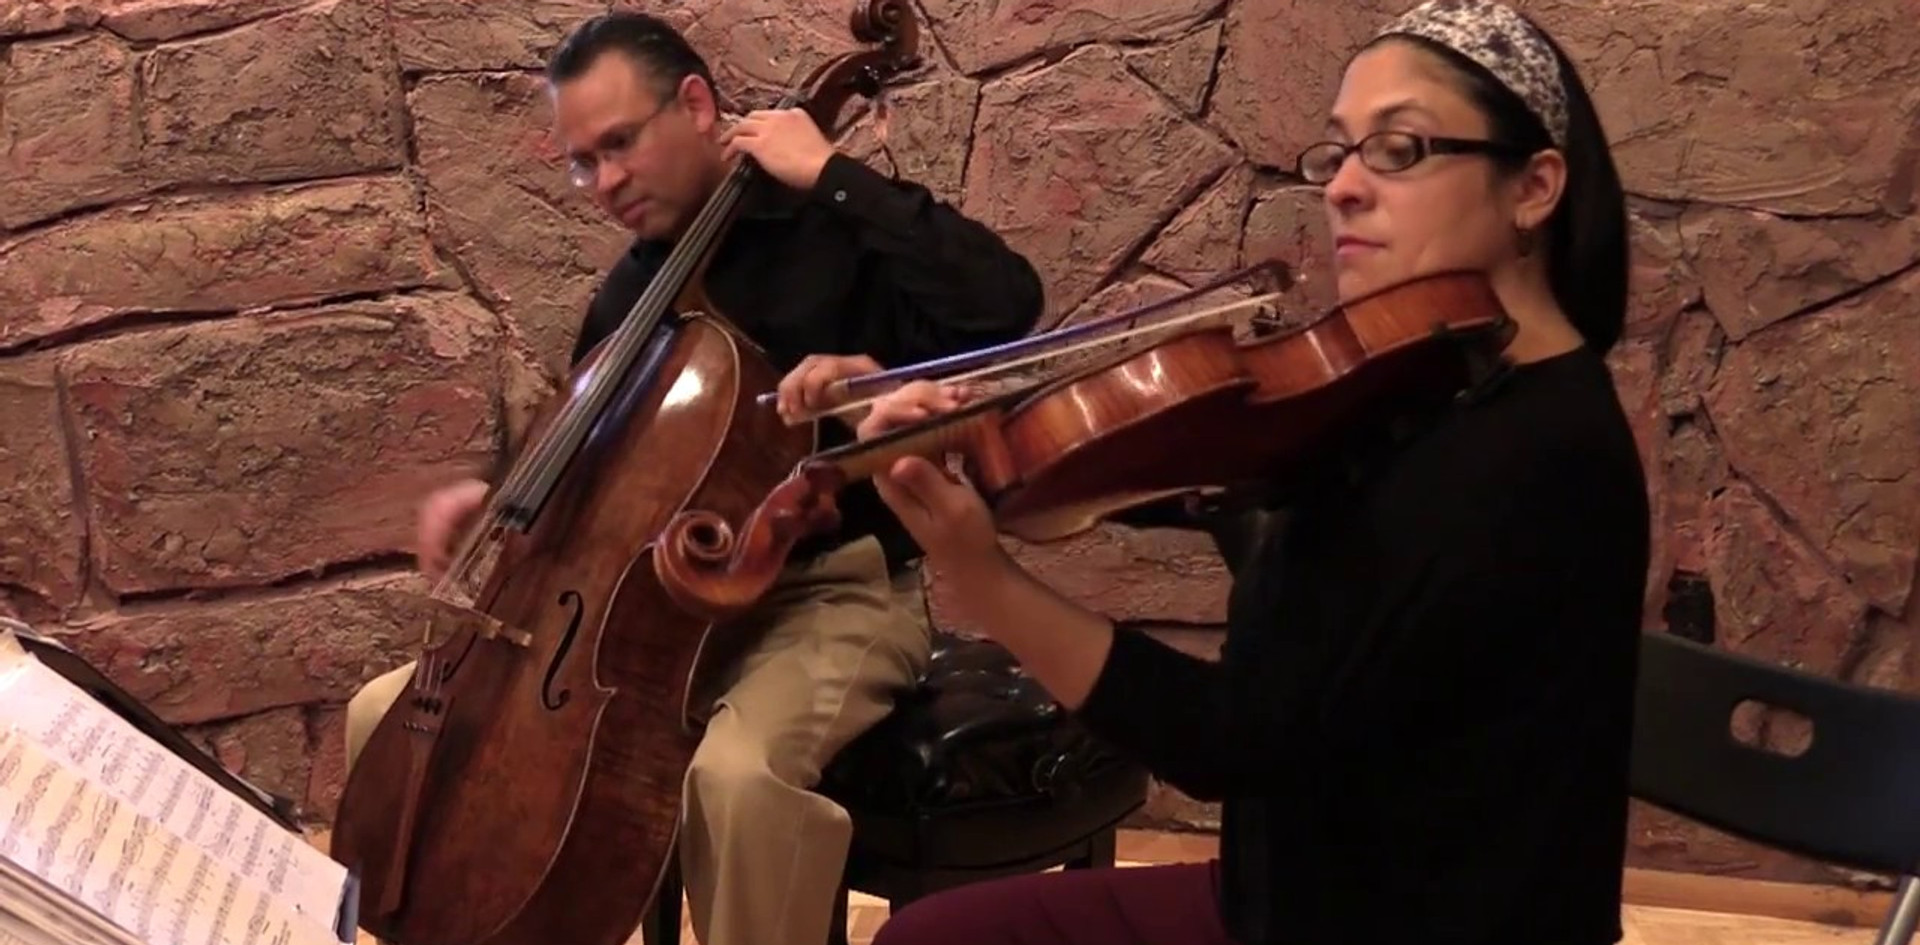 Dalí Quartet performs Wapango by Paquito D'Rivera